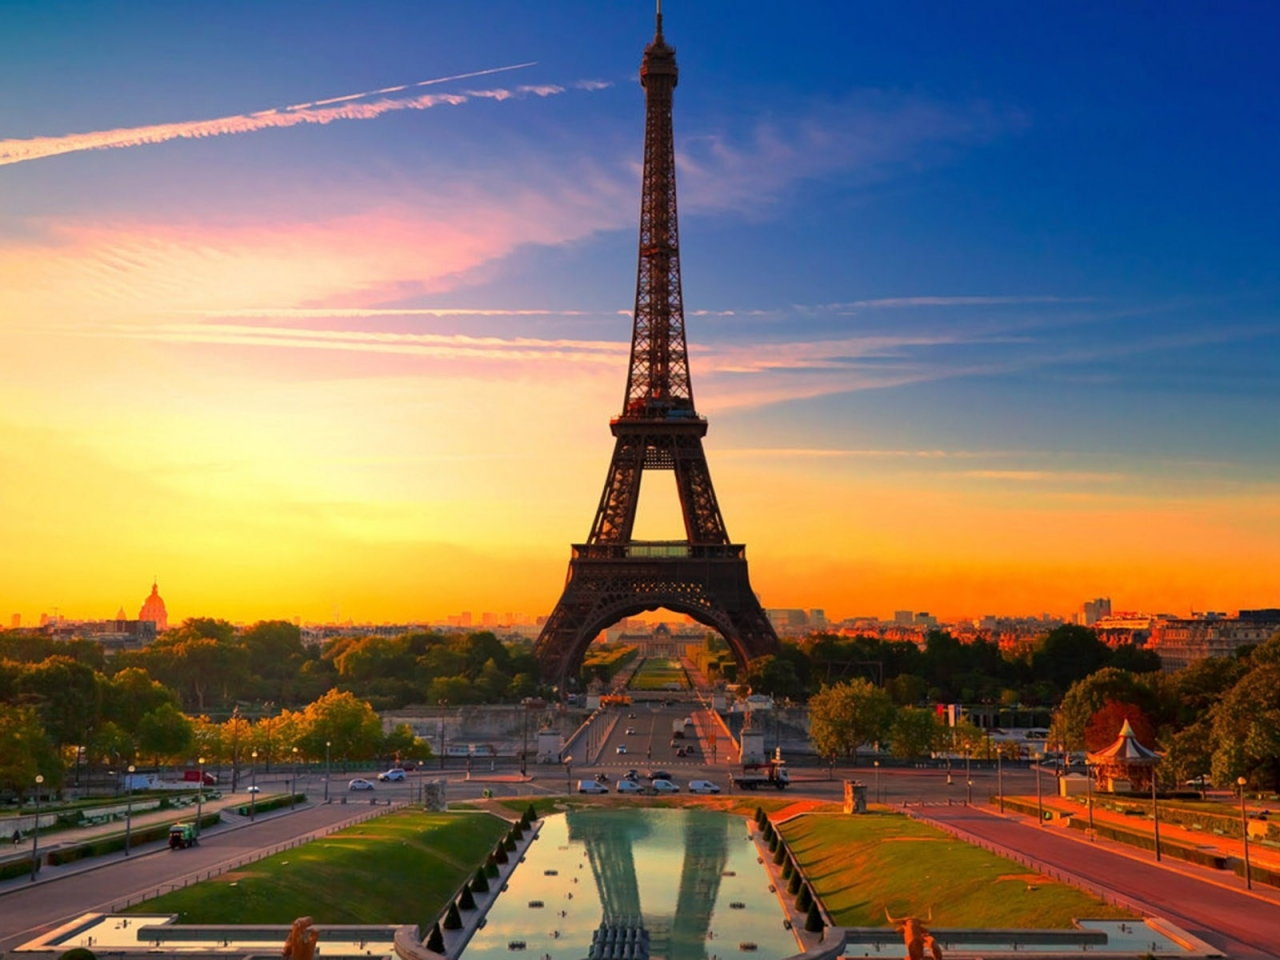 La torre Eiffel al atardecer - 1280x960